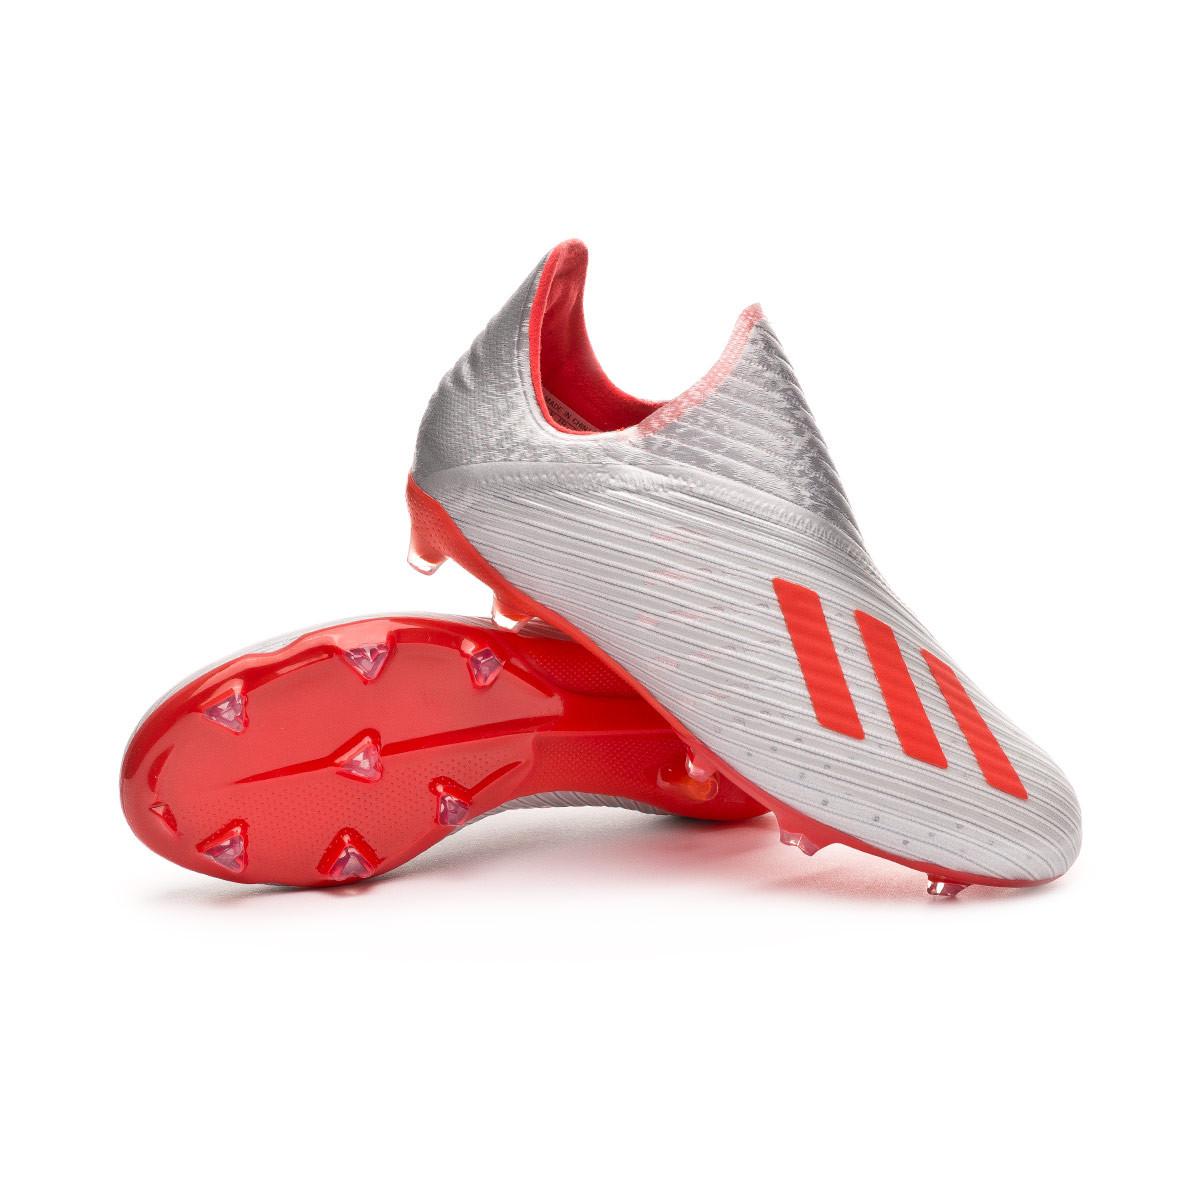 adidas X 19+ SG 302 Redirect Silver MetallicRedFootwear White